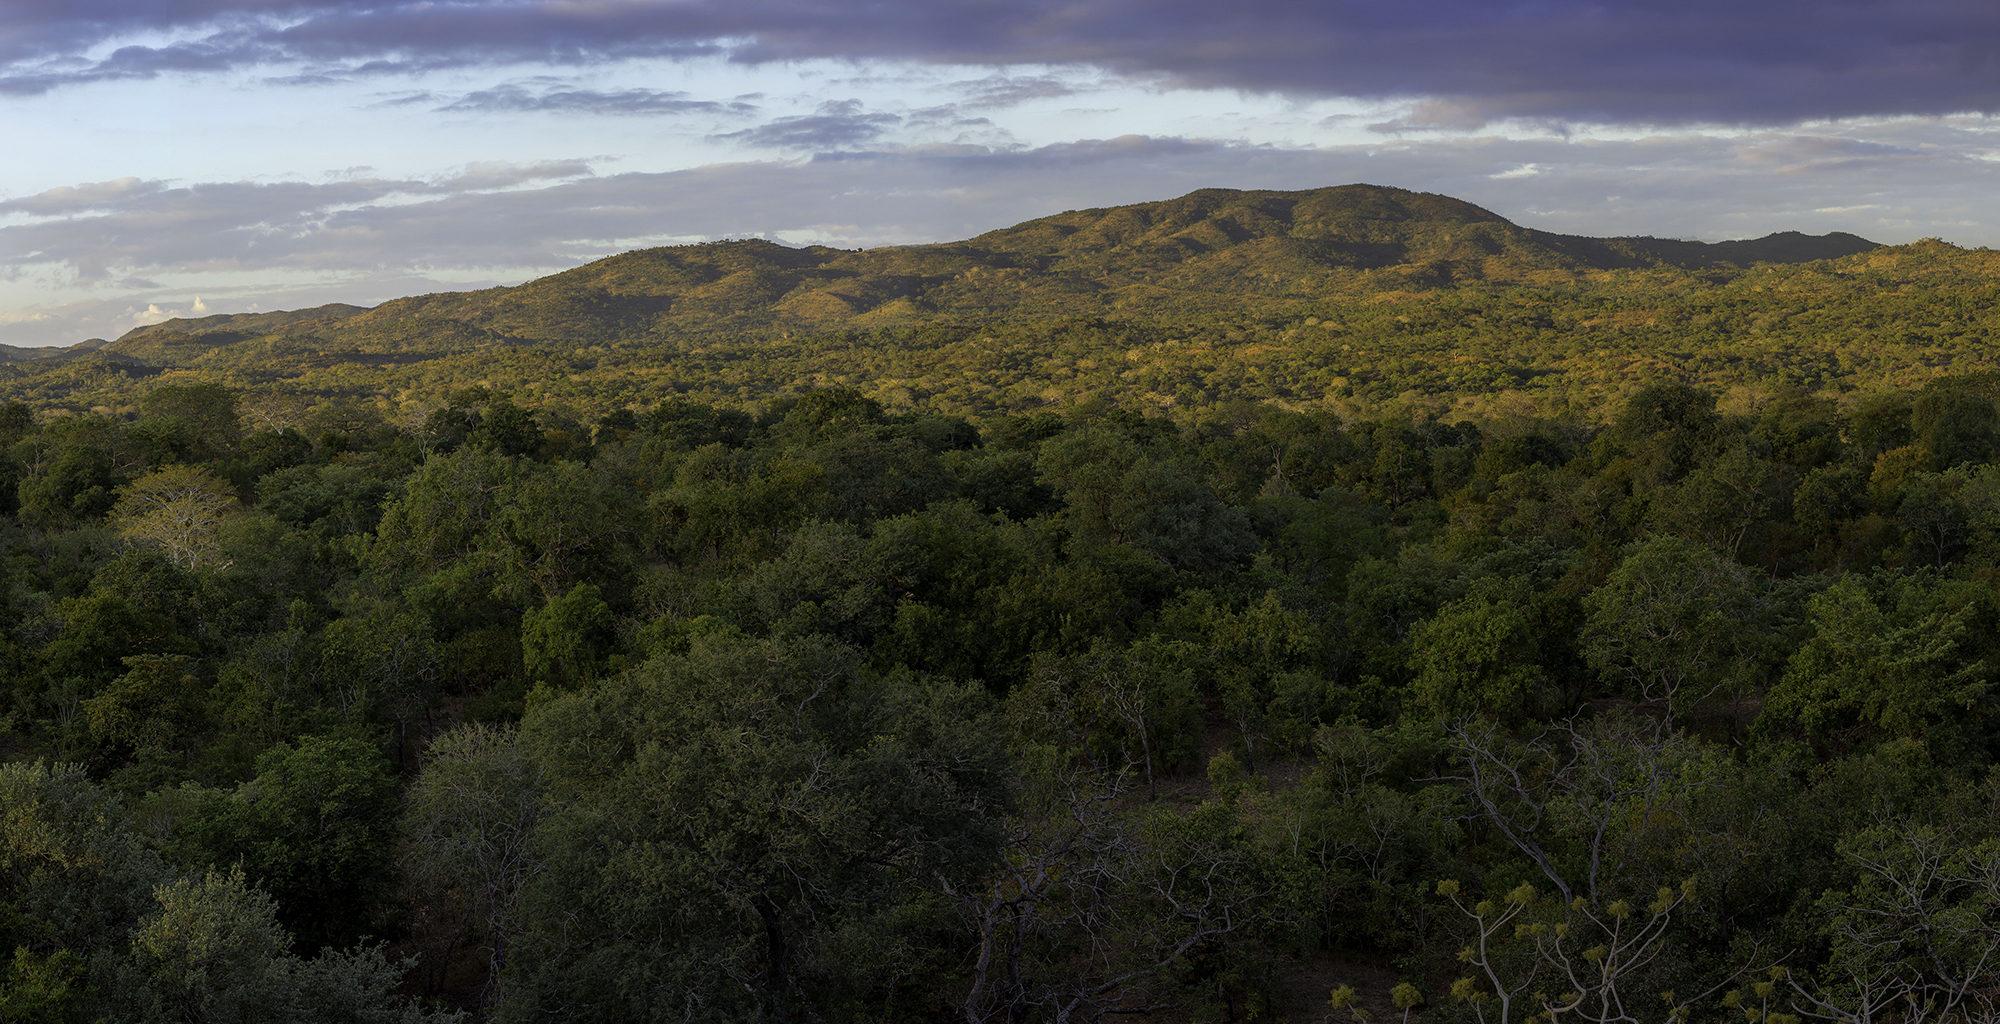 Malawi-Majete-Wildlife-Reserve-Landscape